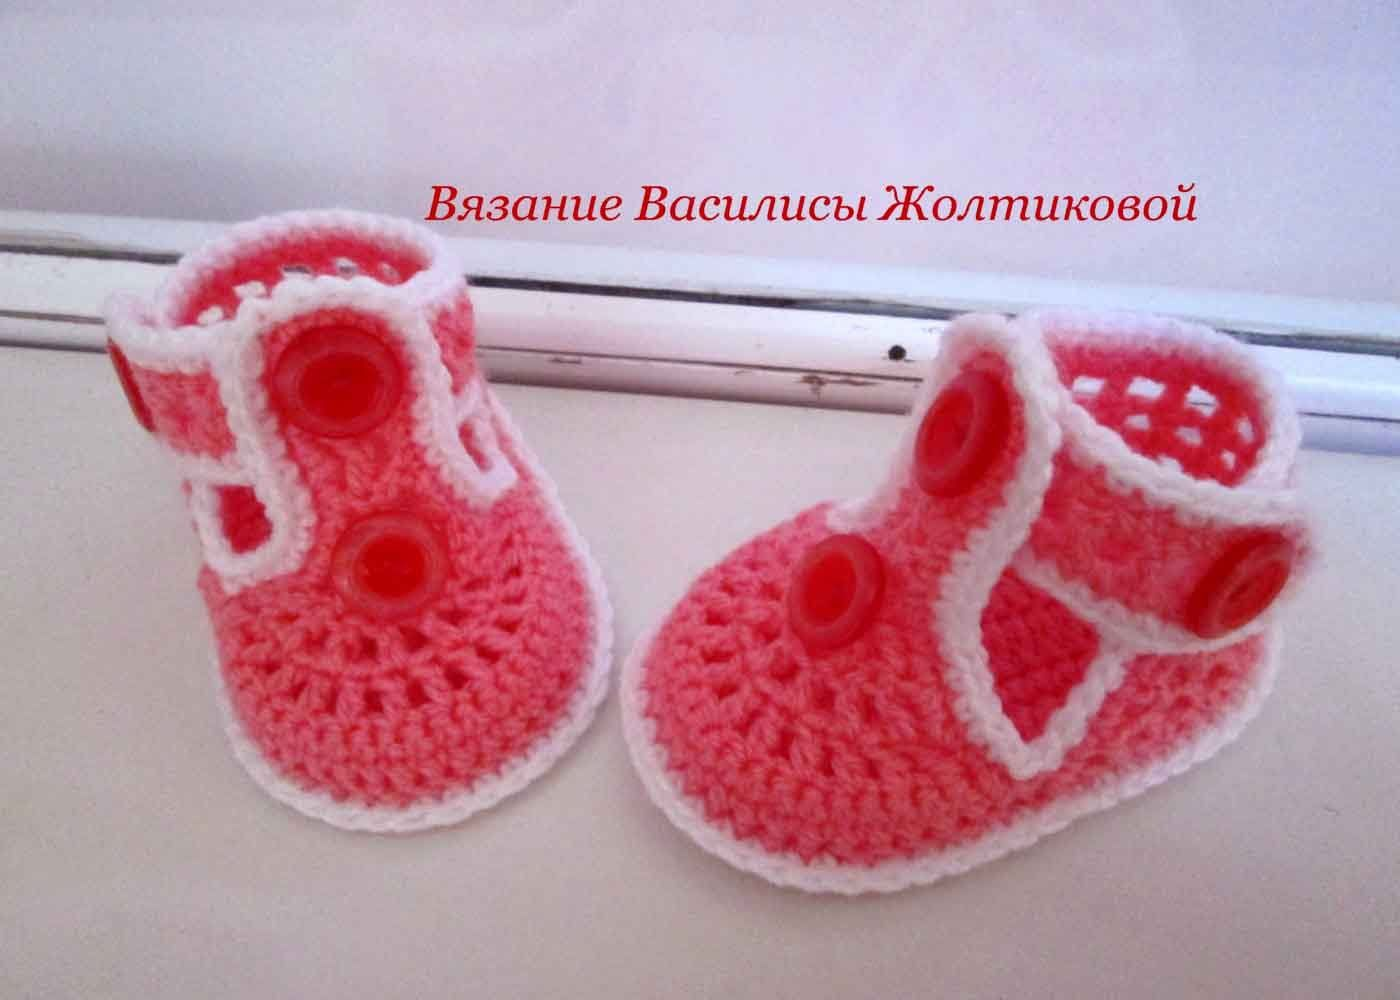 Пинетки сандалии крючком лето розовые | Zapatos bebe 2 | Pinterest ...